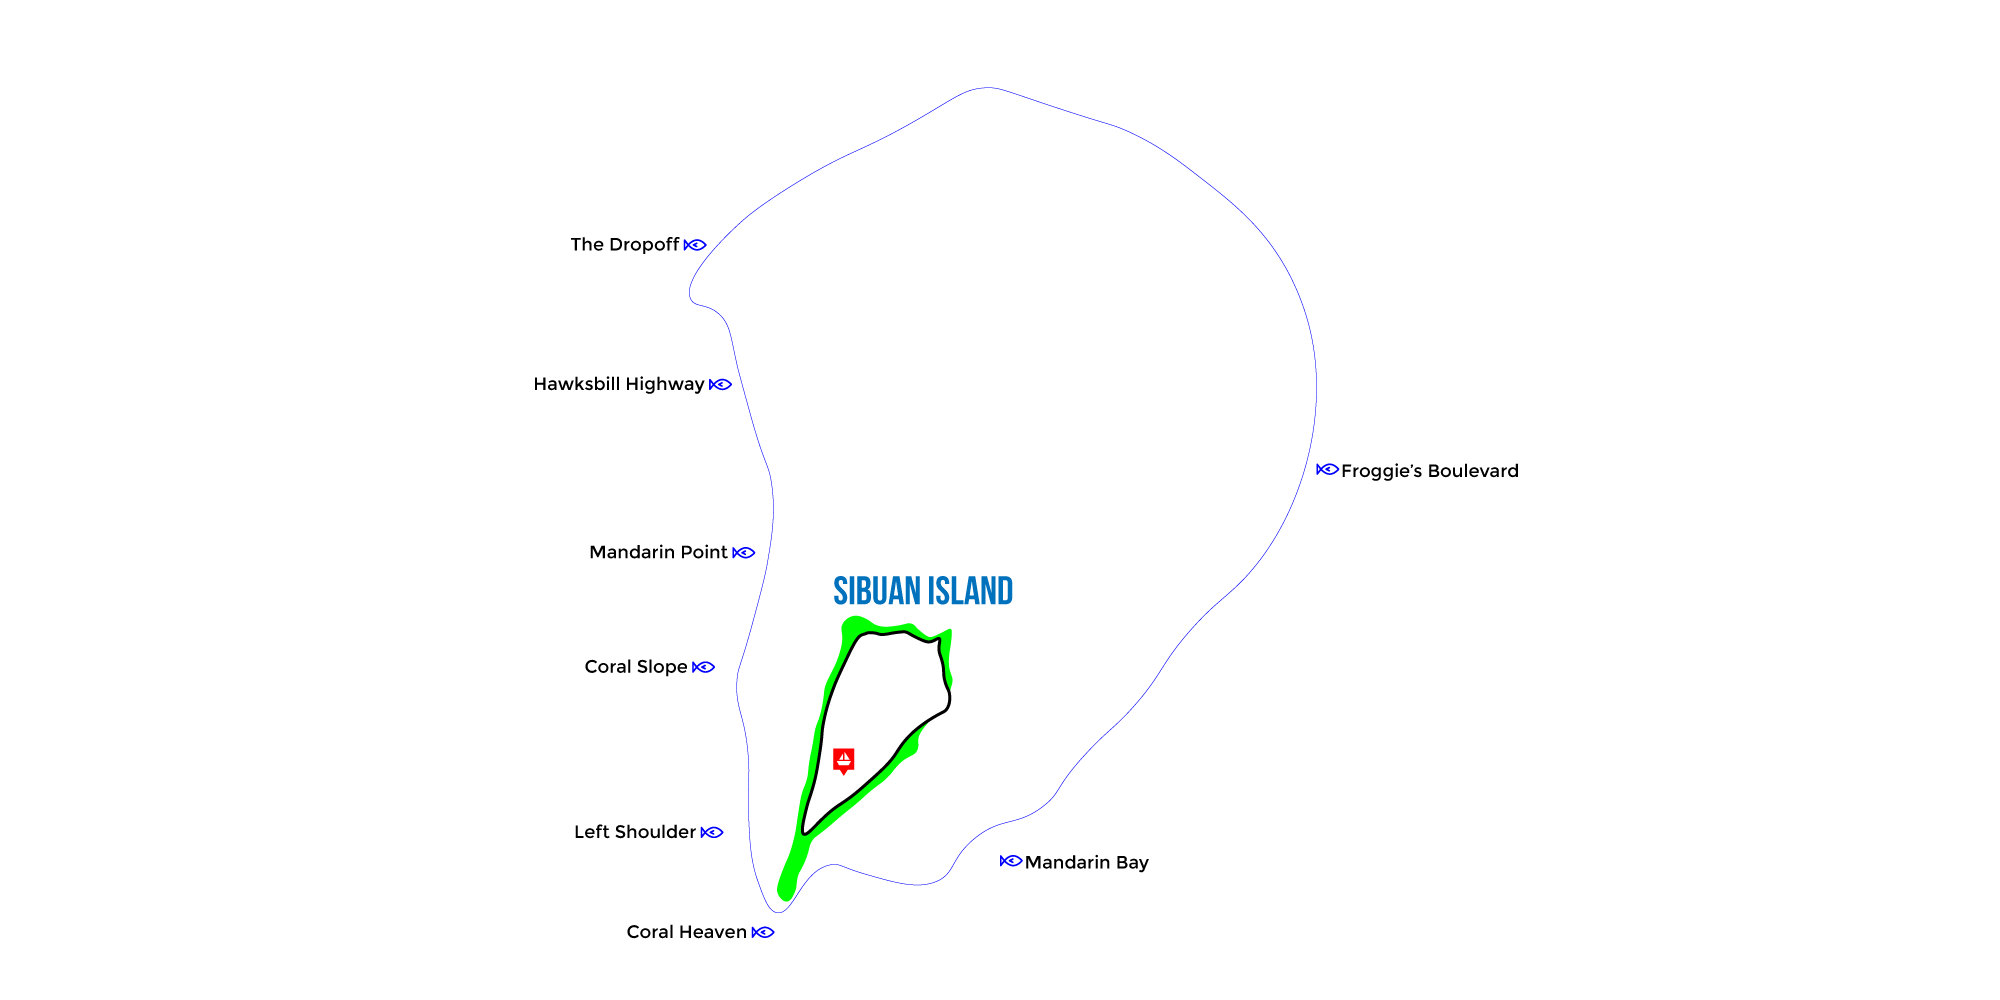 Sibuan Map